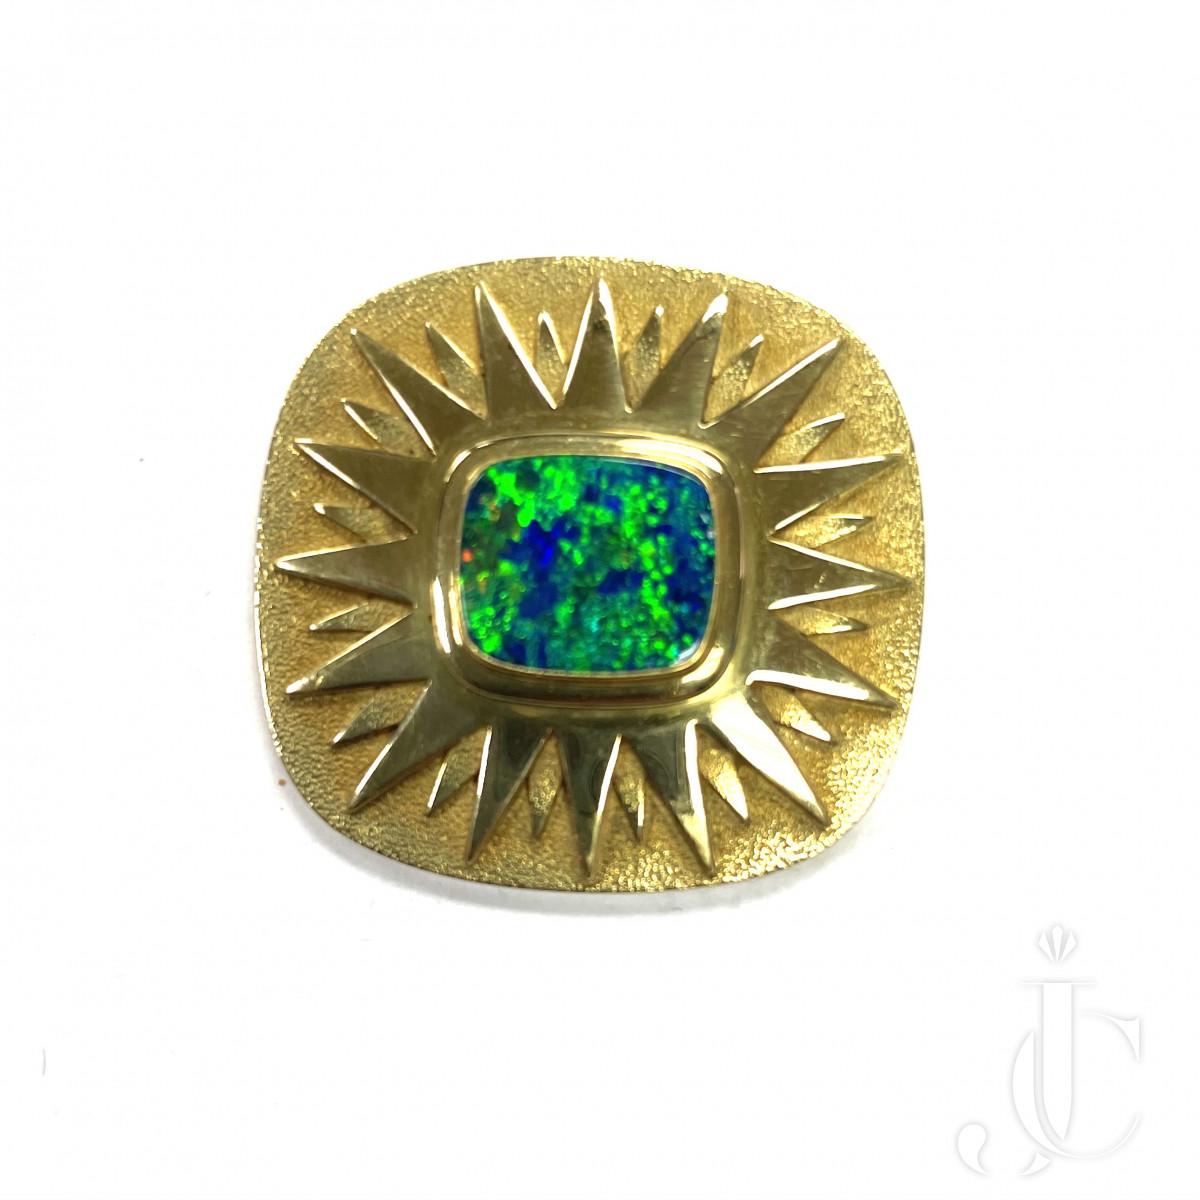 18 KT Gold Opal Pin - 24 Grams